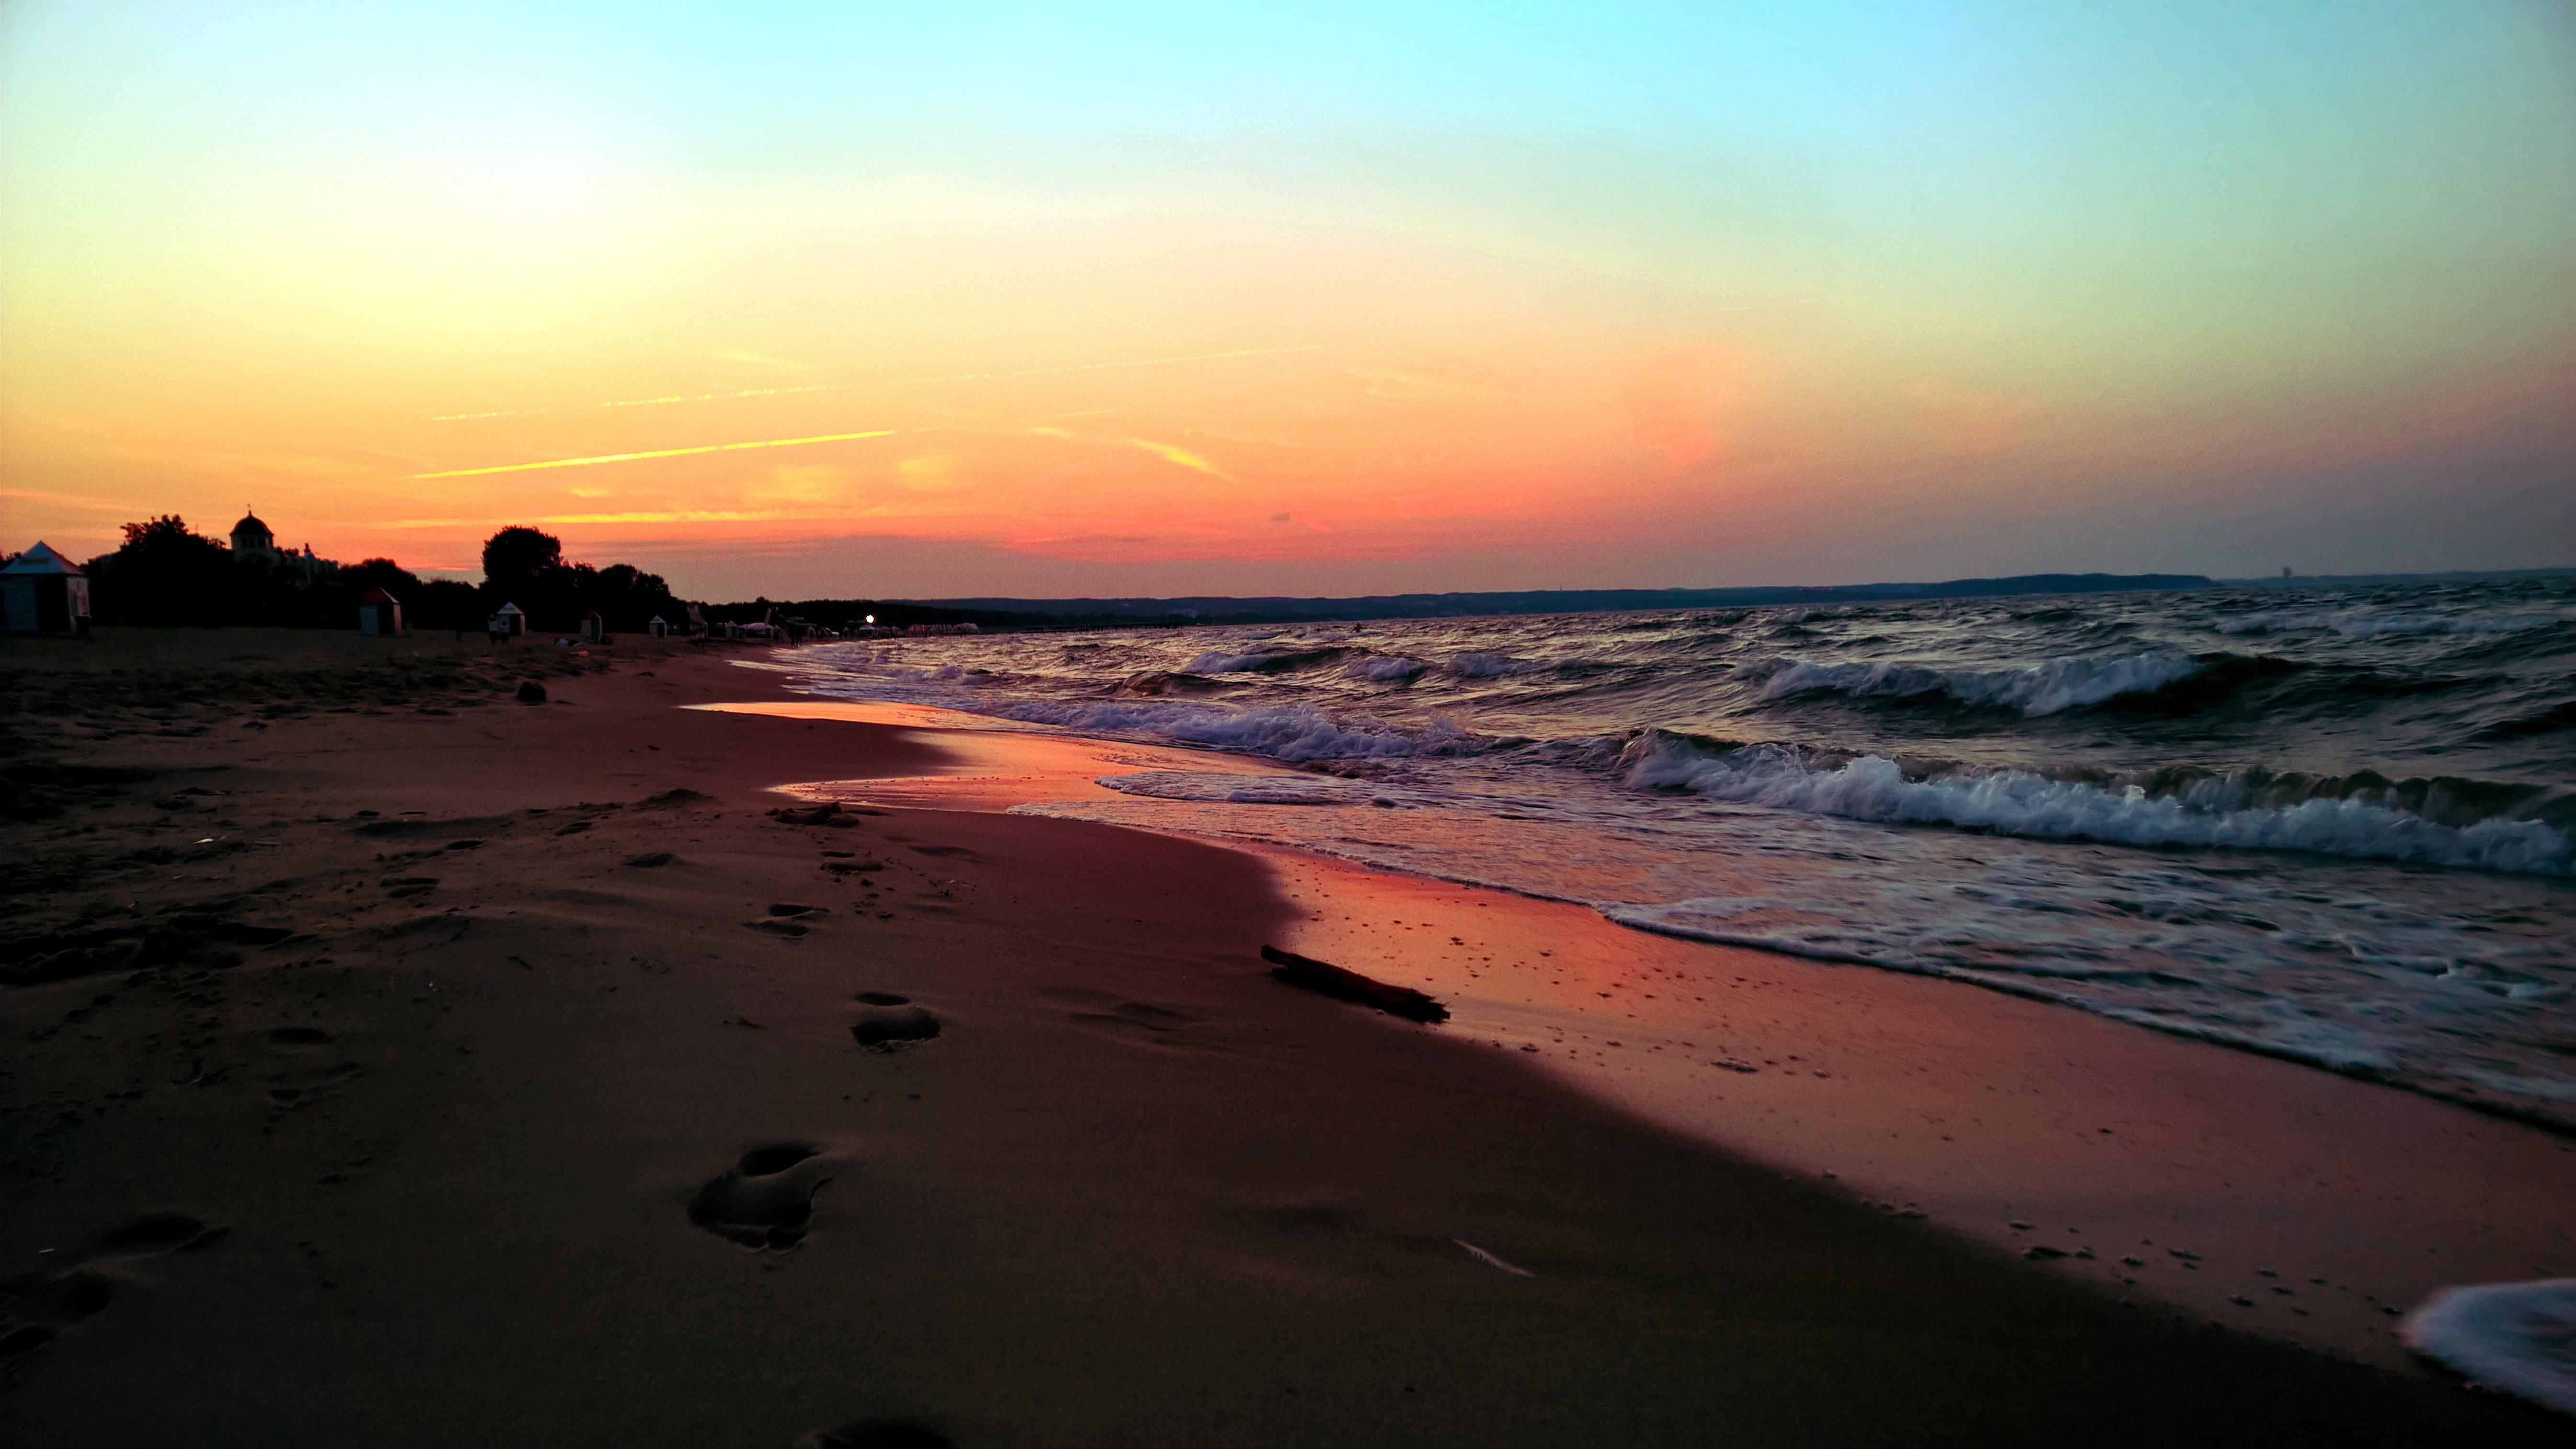 beach-sea-coast-sand-ocean-horizon-sun-sunrise-sunset-morning-shore-wave-dawn-dusk-evening-bay-body-of-water-cape-afterglow-wind-wave-65525